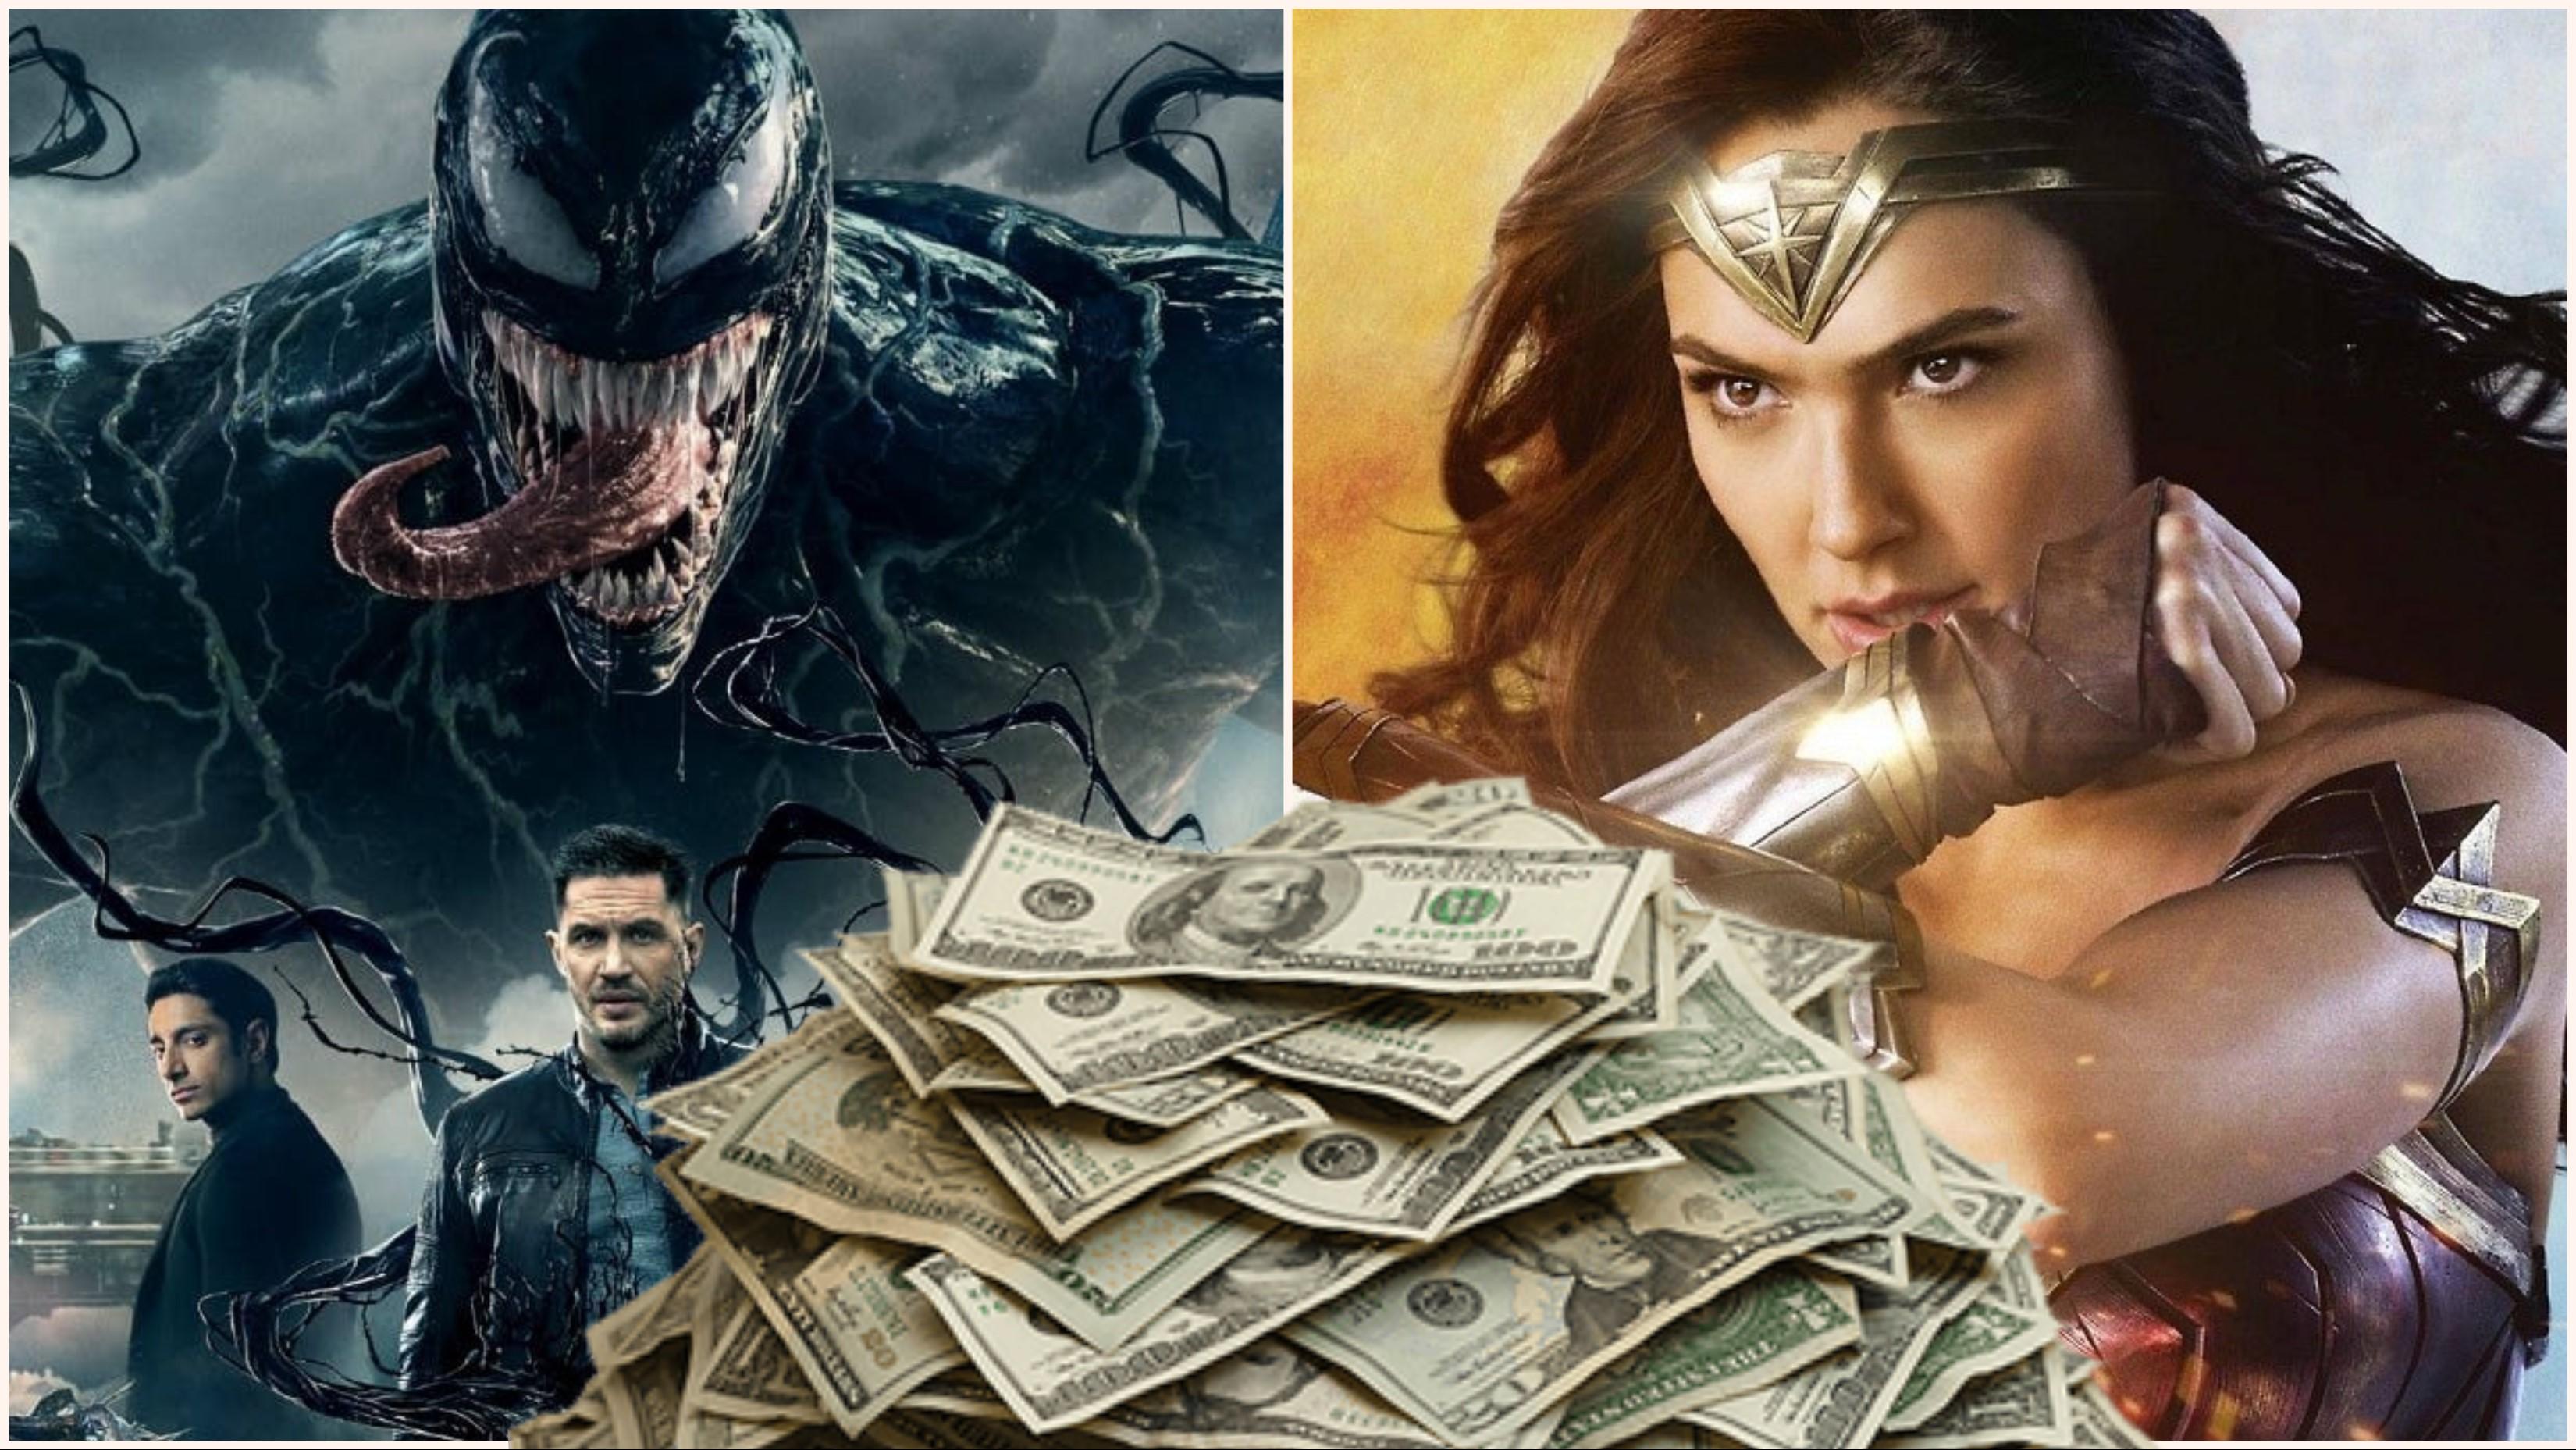 Venom' Passes 'Wonder Woman' At Box Office - FandomWire